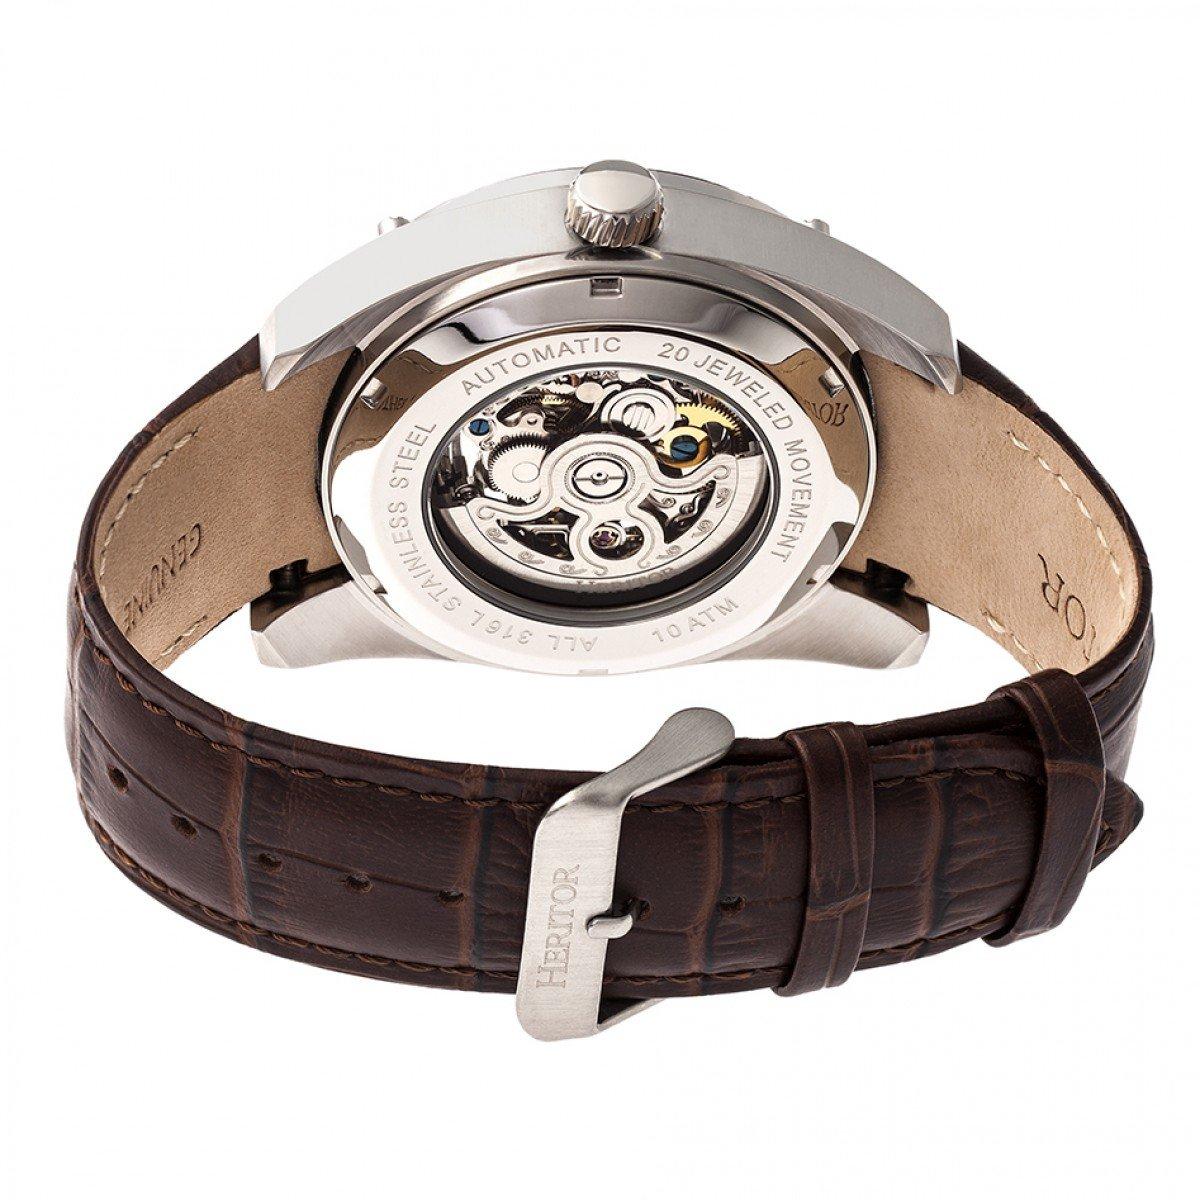 Amazon.com: Heritor Automatic Hr7404 Daniels Mens Watch: Heritor Automatic: Watches